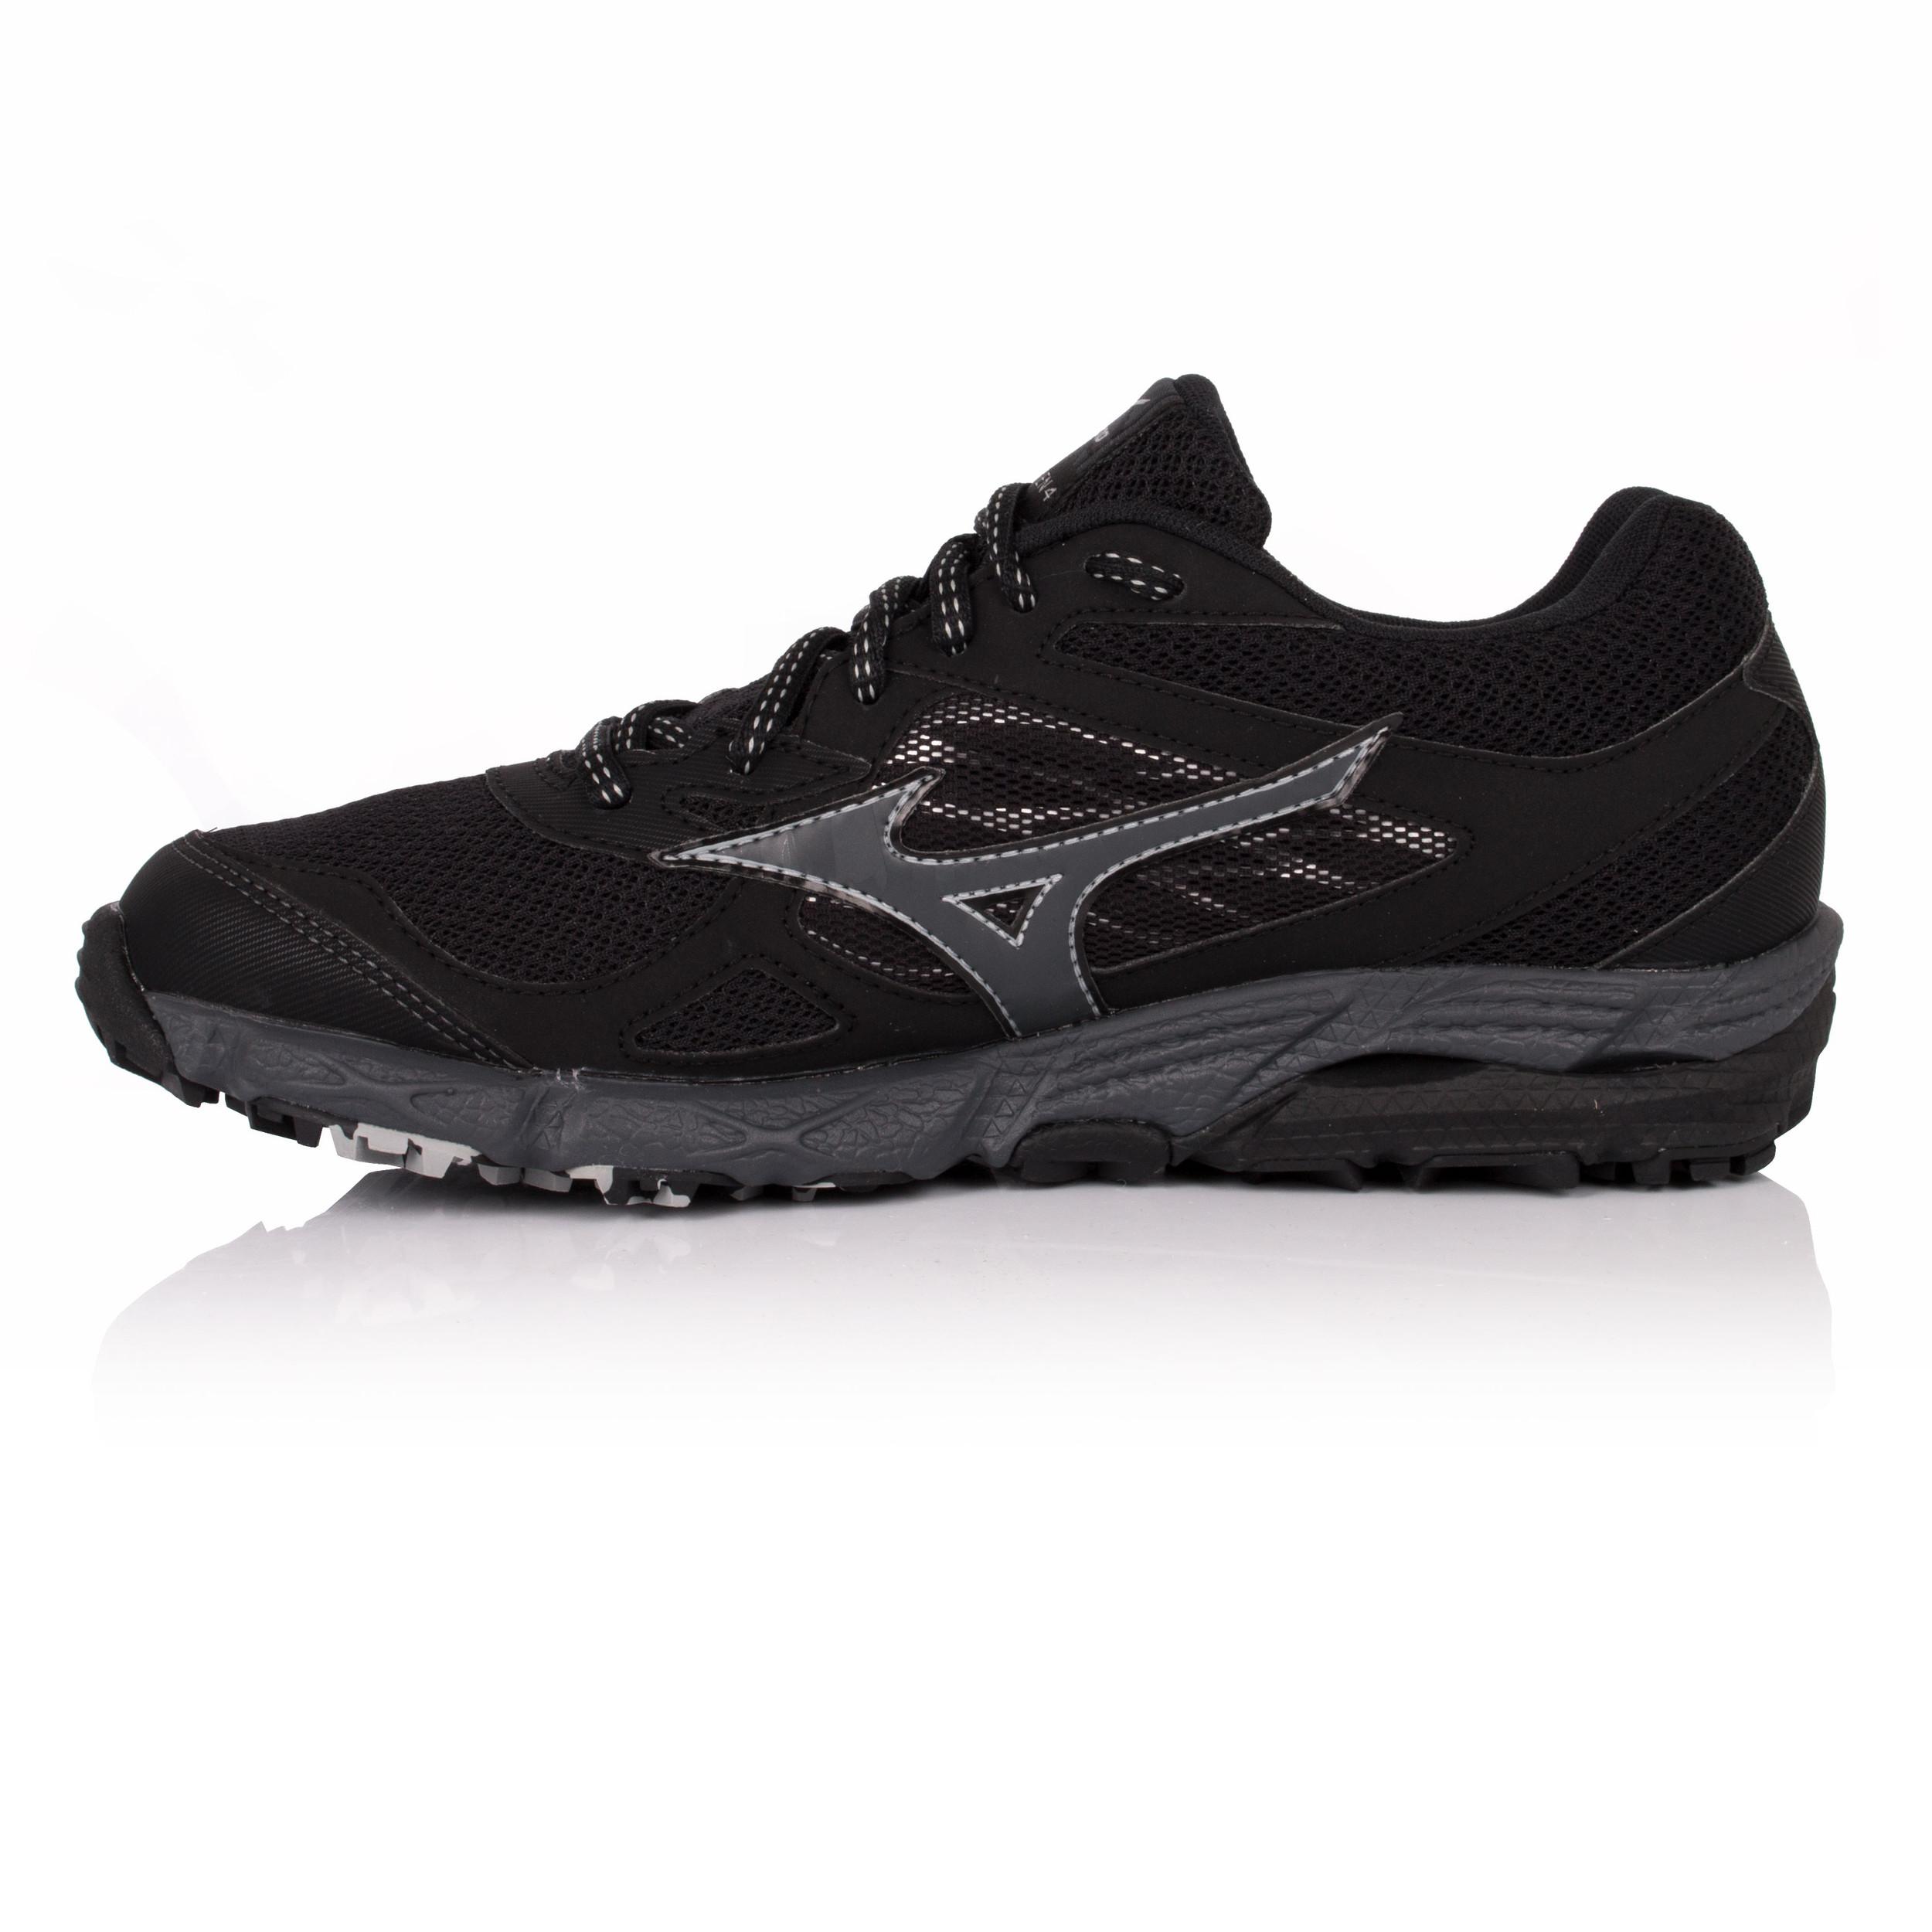 b3a8264dca Acquista scarpe da ginnastica mizuno - OFF41% sconti